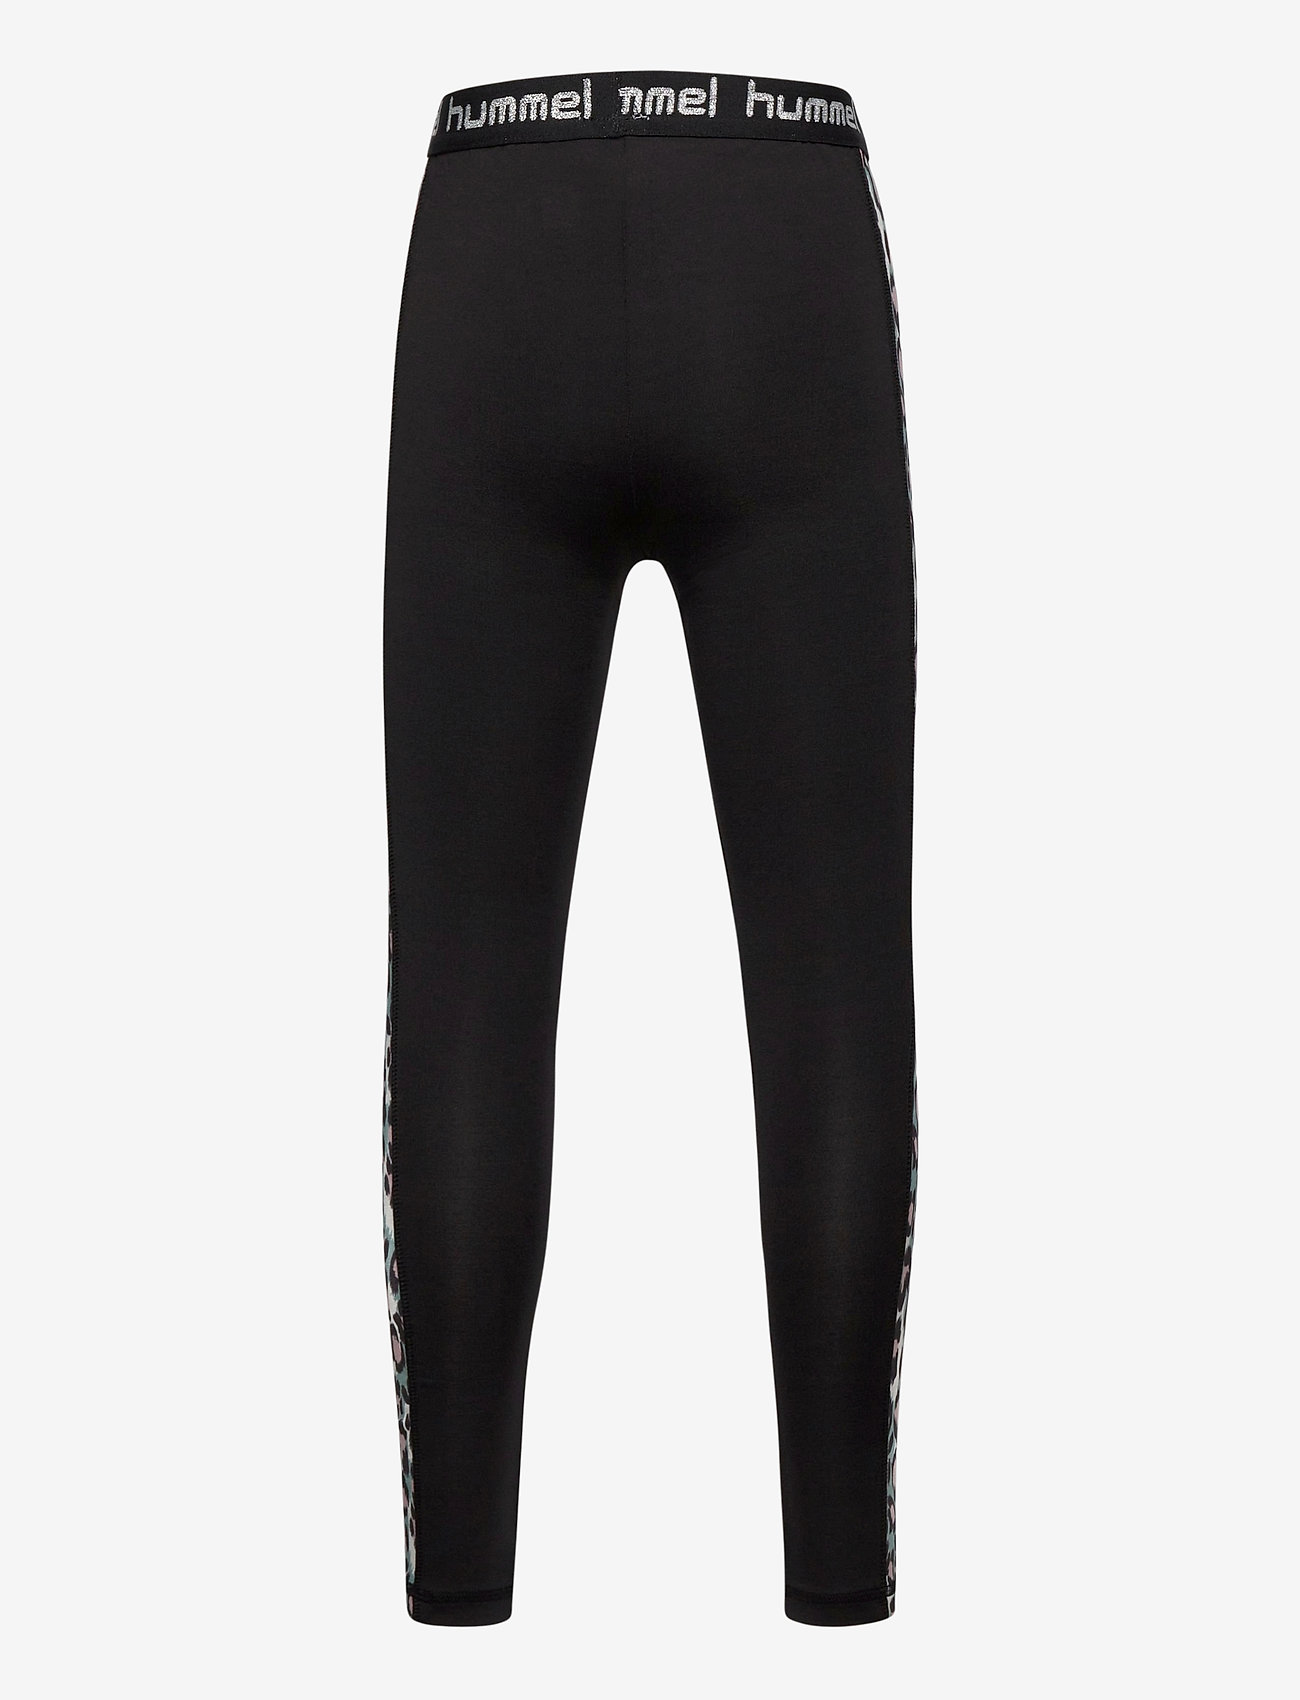 Hummel - hmlNANNA TIGHTS - leggings - black - 1